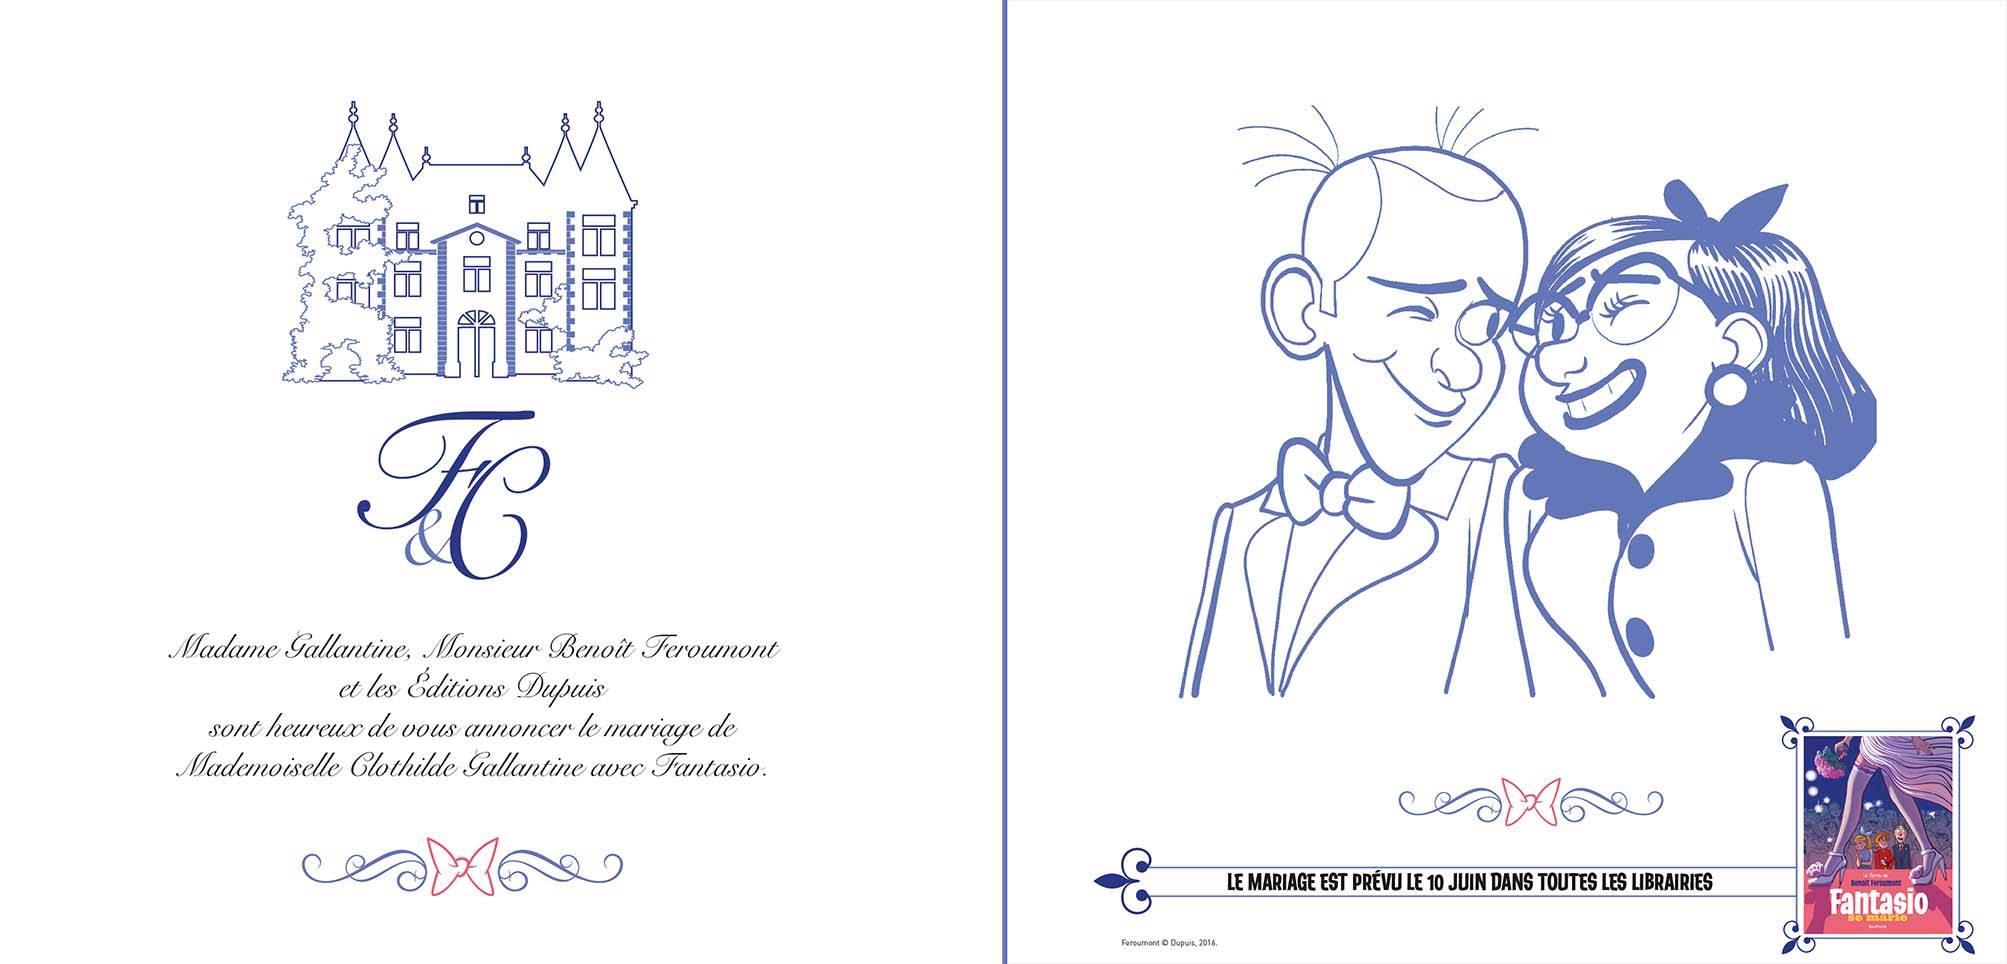 Spirou - Fantasio se marie - Benoit Feroumont - faire-part mariage